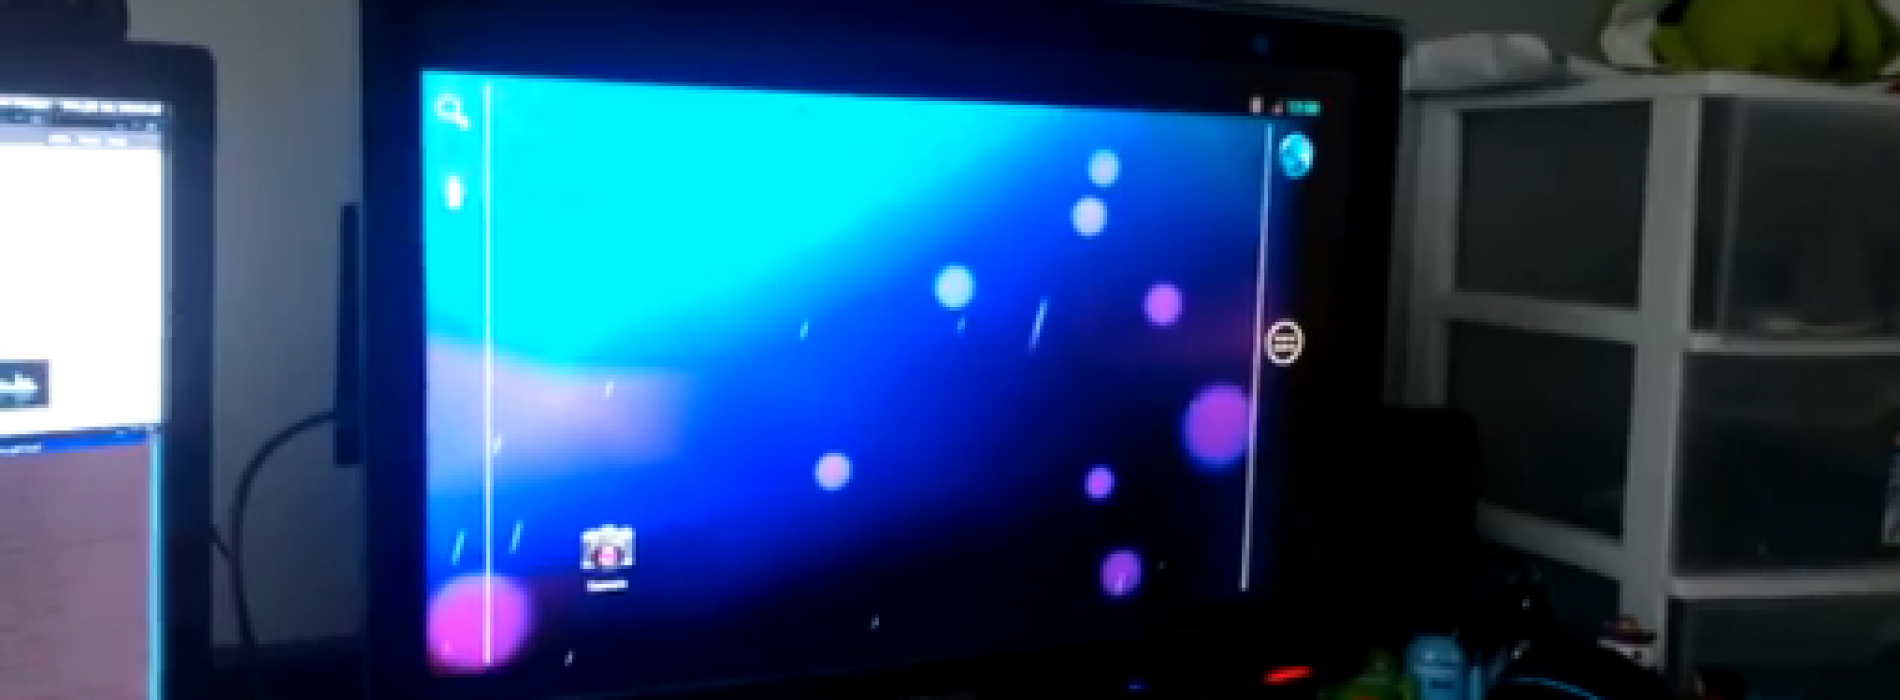 CyanogenMod 9 running on the Nexus Q [video]